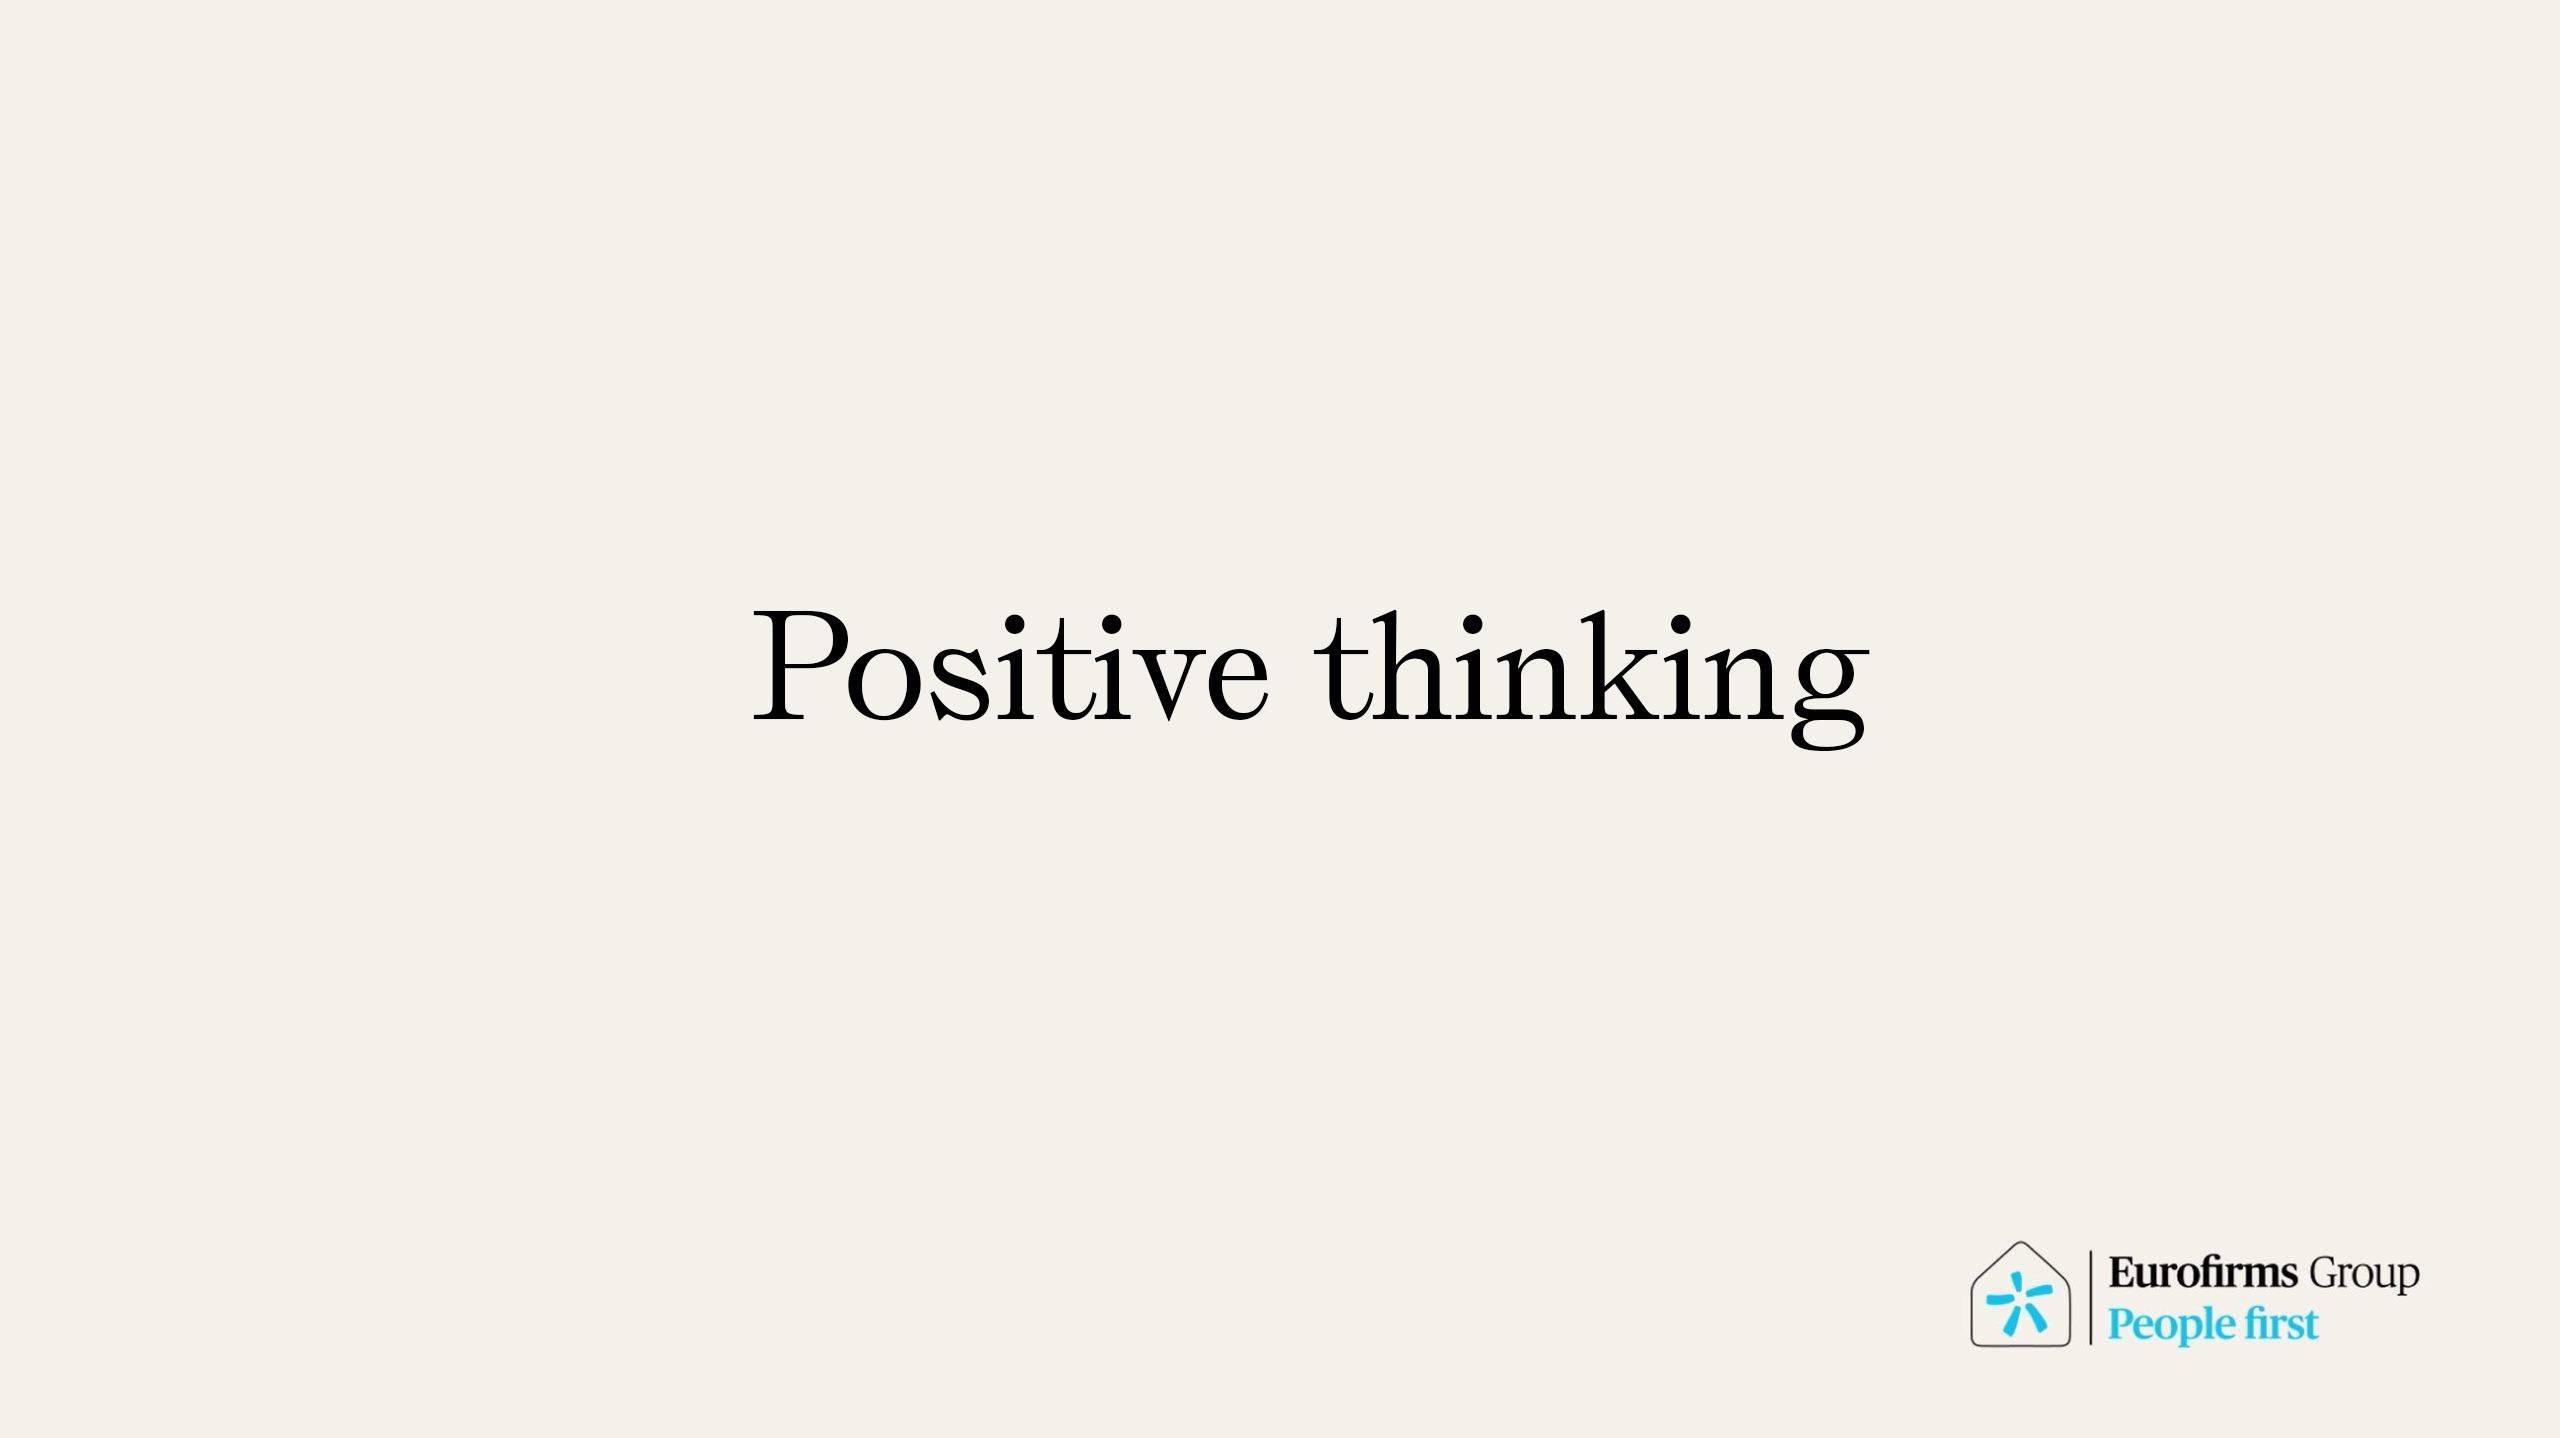 7 ways to keep positive thinking